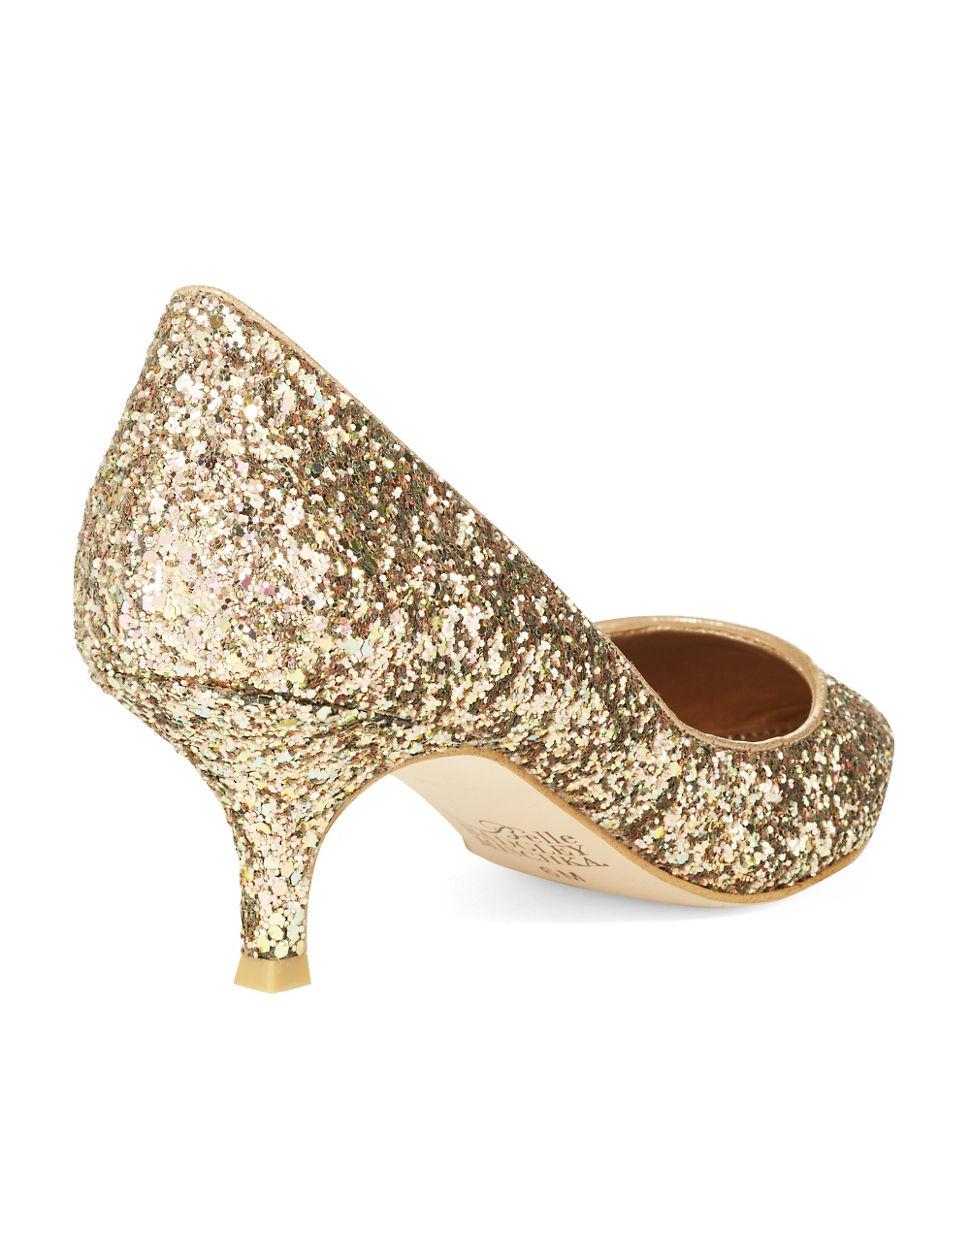 Belle by badgley mischka Puma Glitter Kitten Heels | Lyst